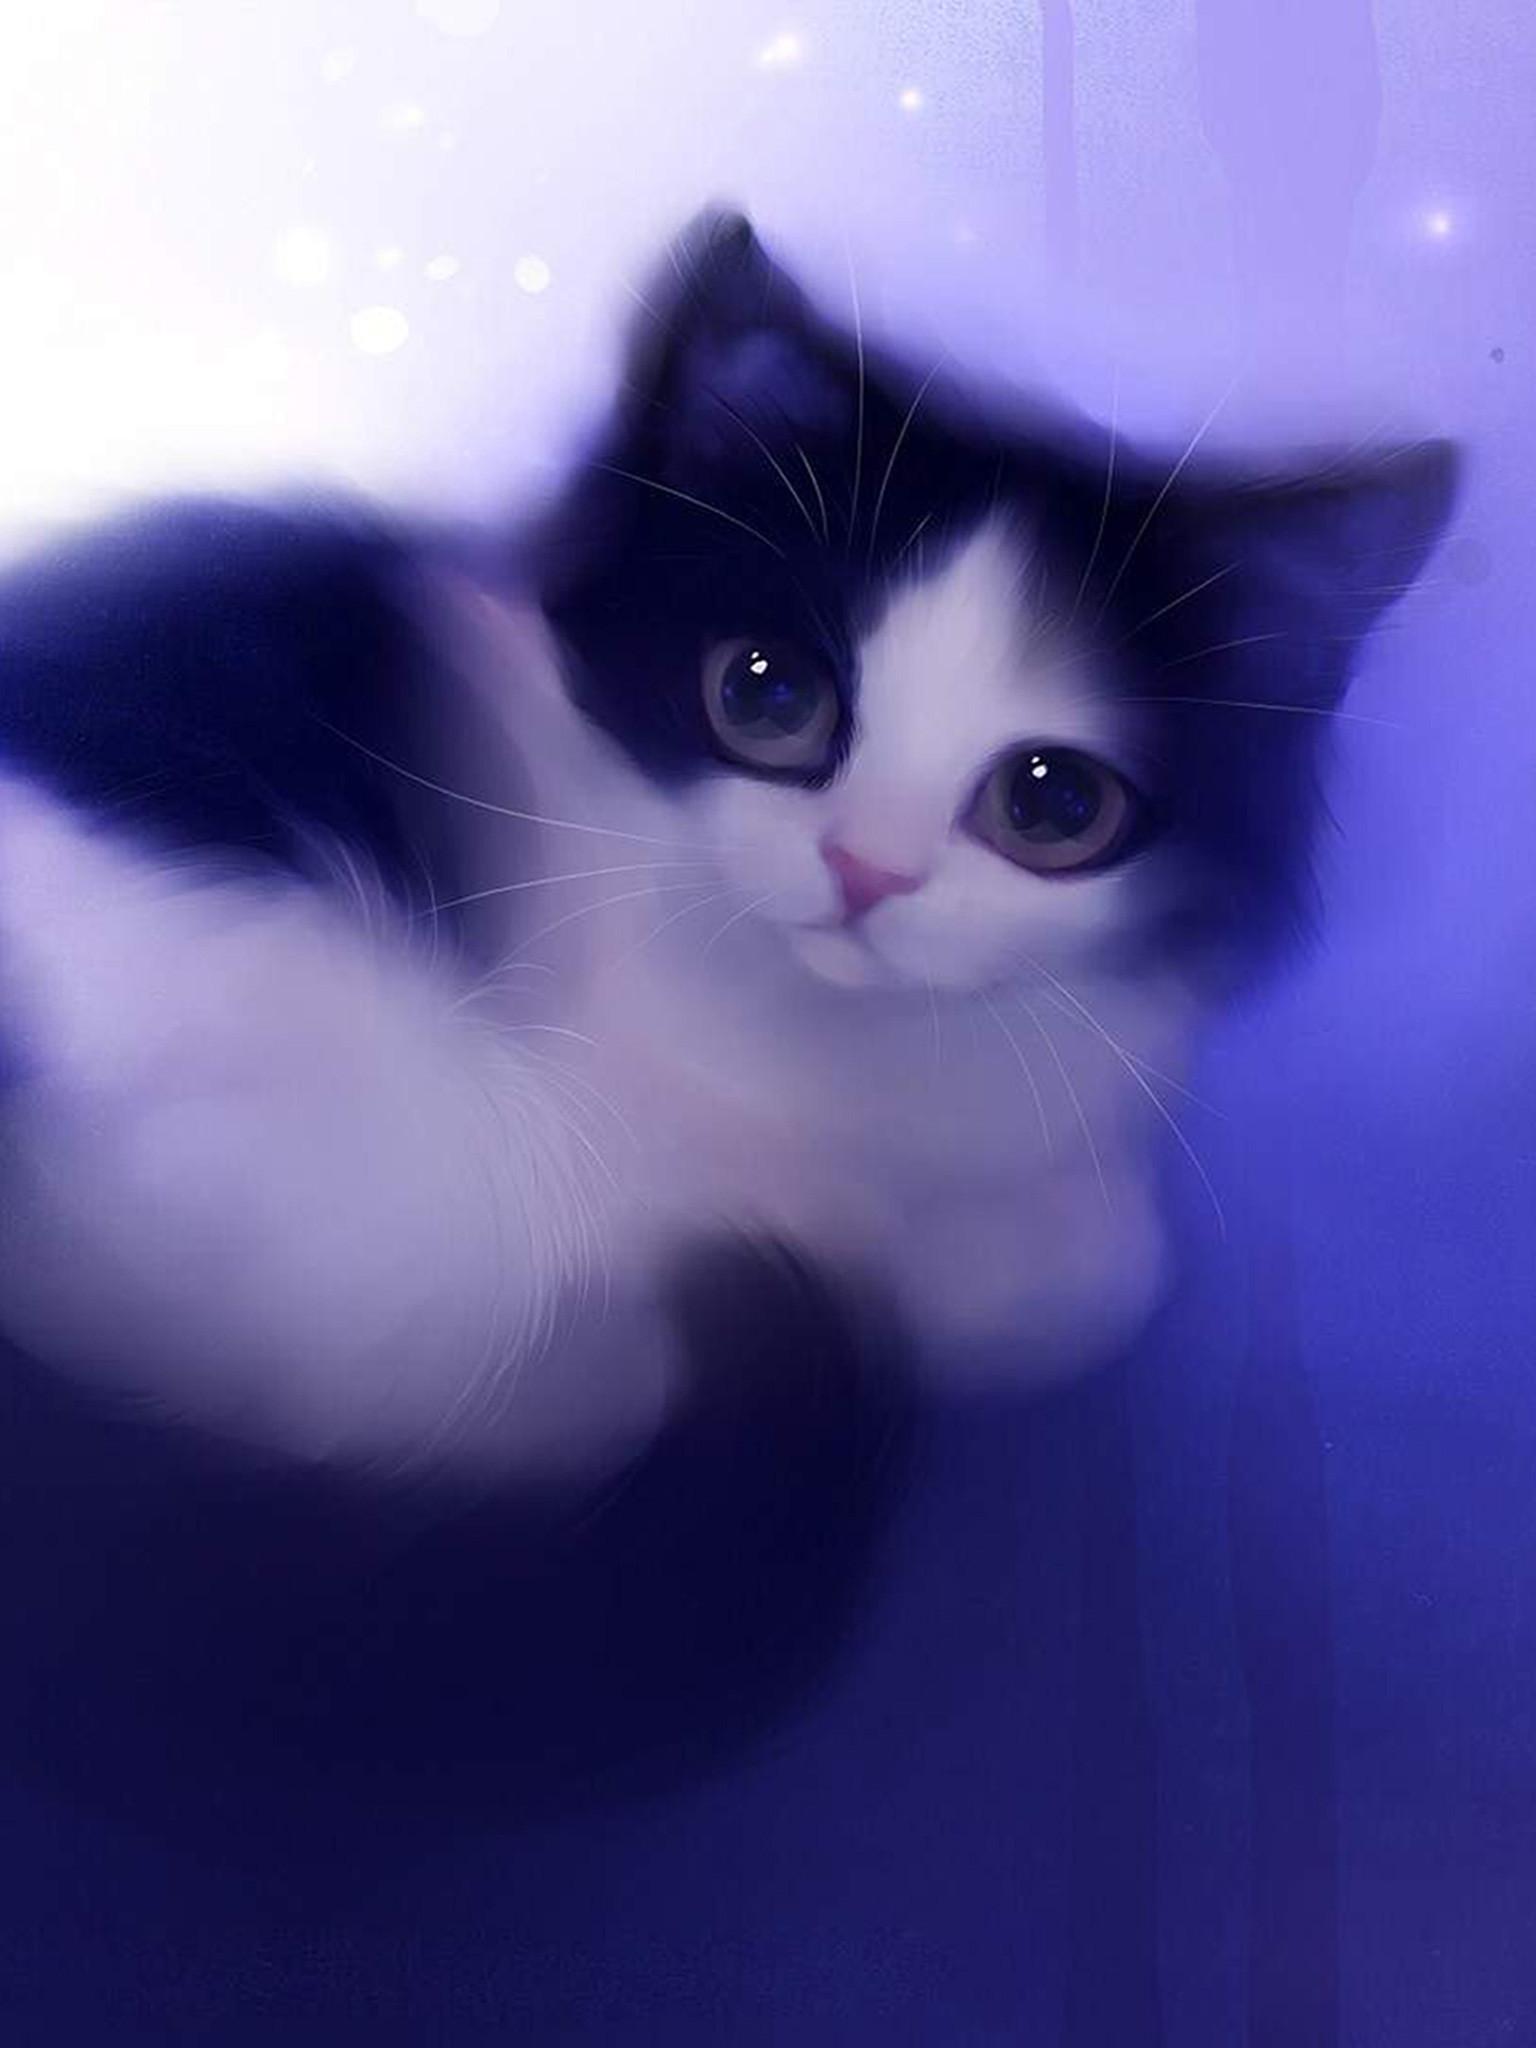 Cute Cartoon Cat Wallpaper Iphone The Best Cat 2018